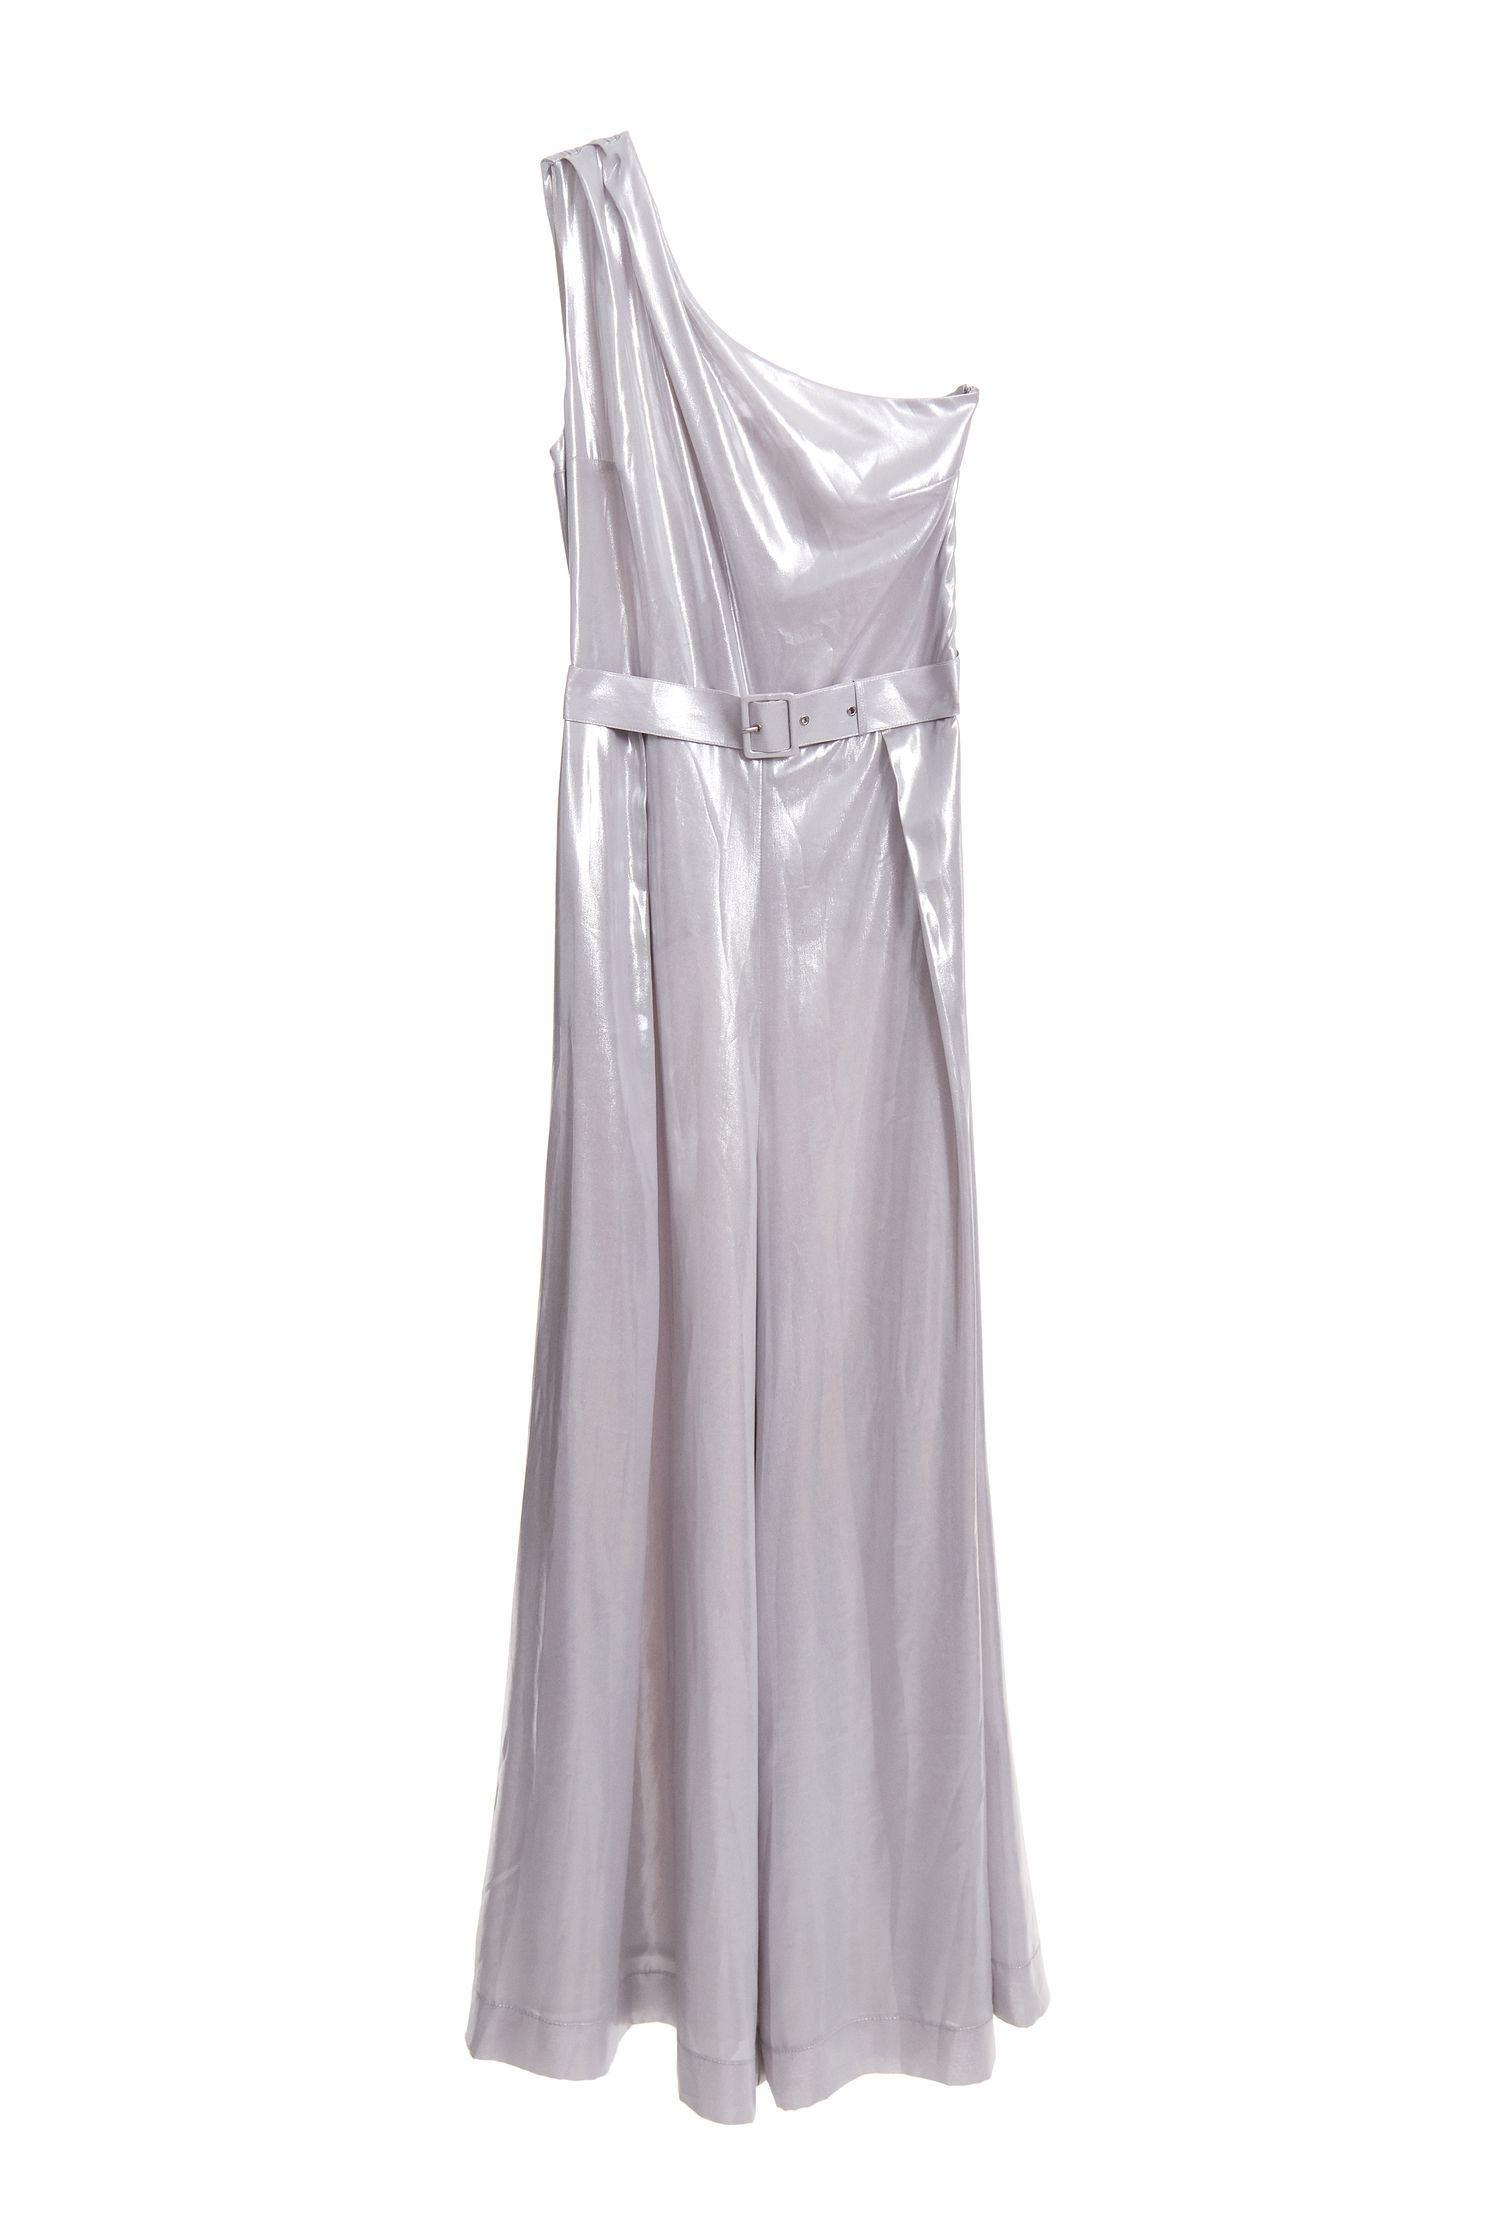 Water-light silver satin jumpsuit wide-leg pants